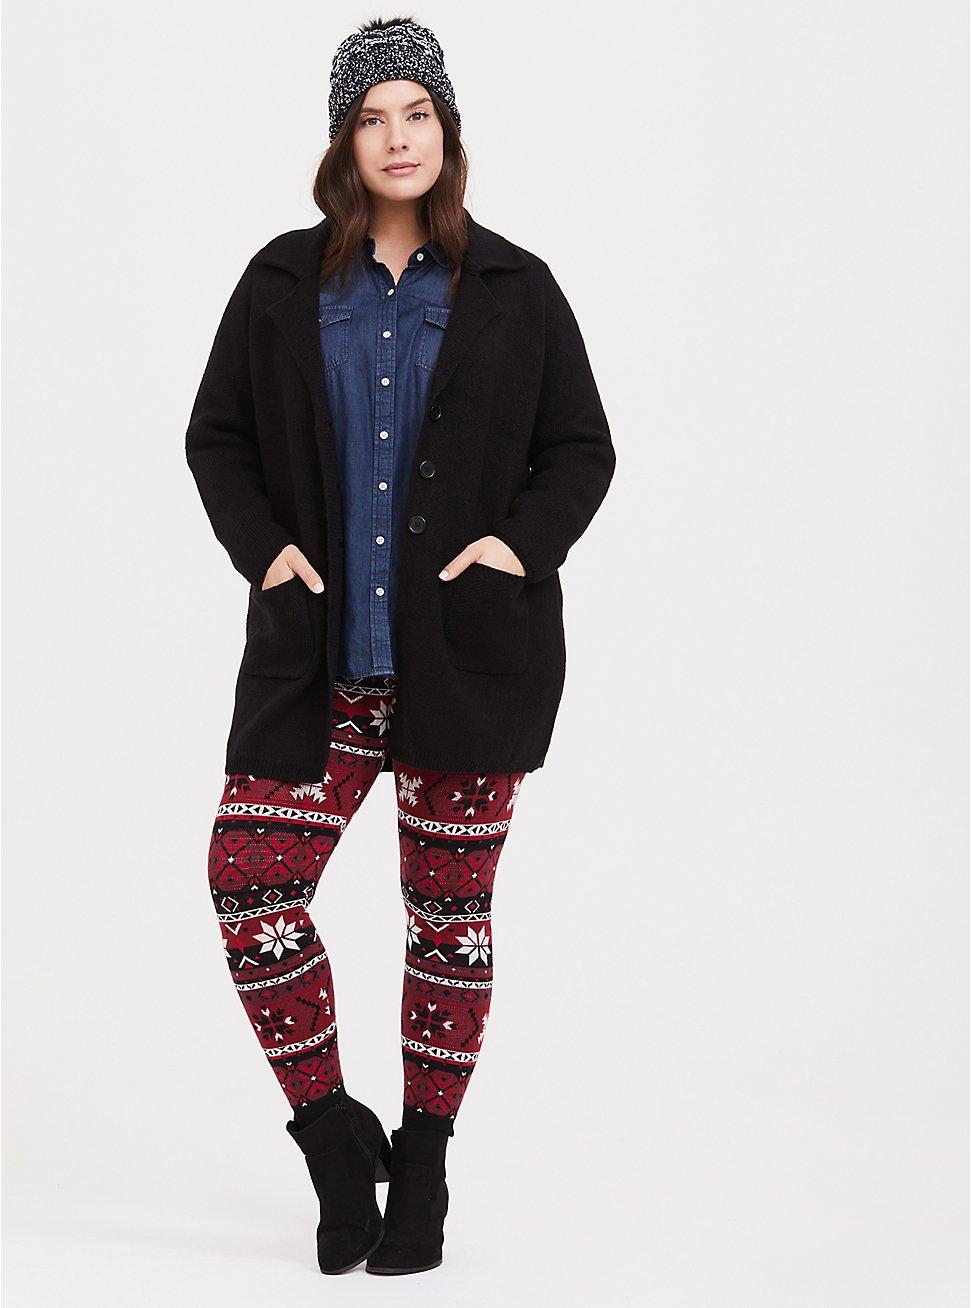 Sweater-Knit Legging - Fair Isle Red & Black, MULTI, hi-res